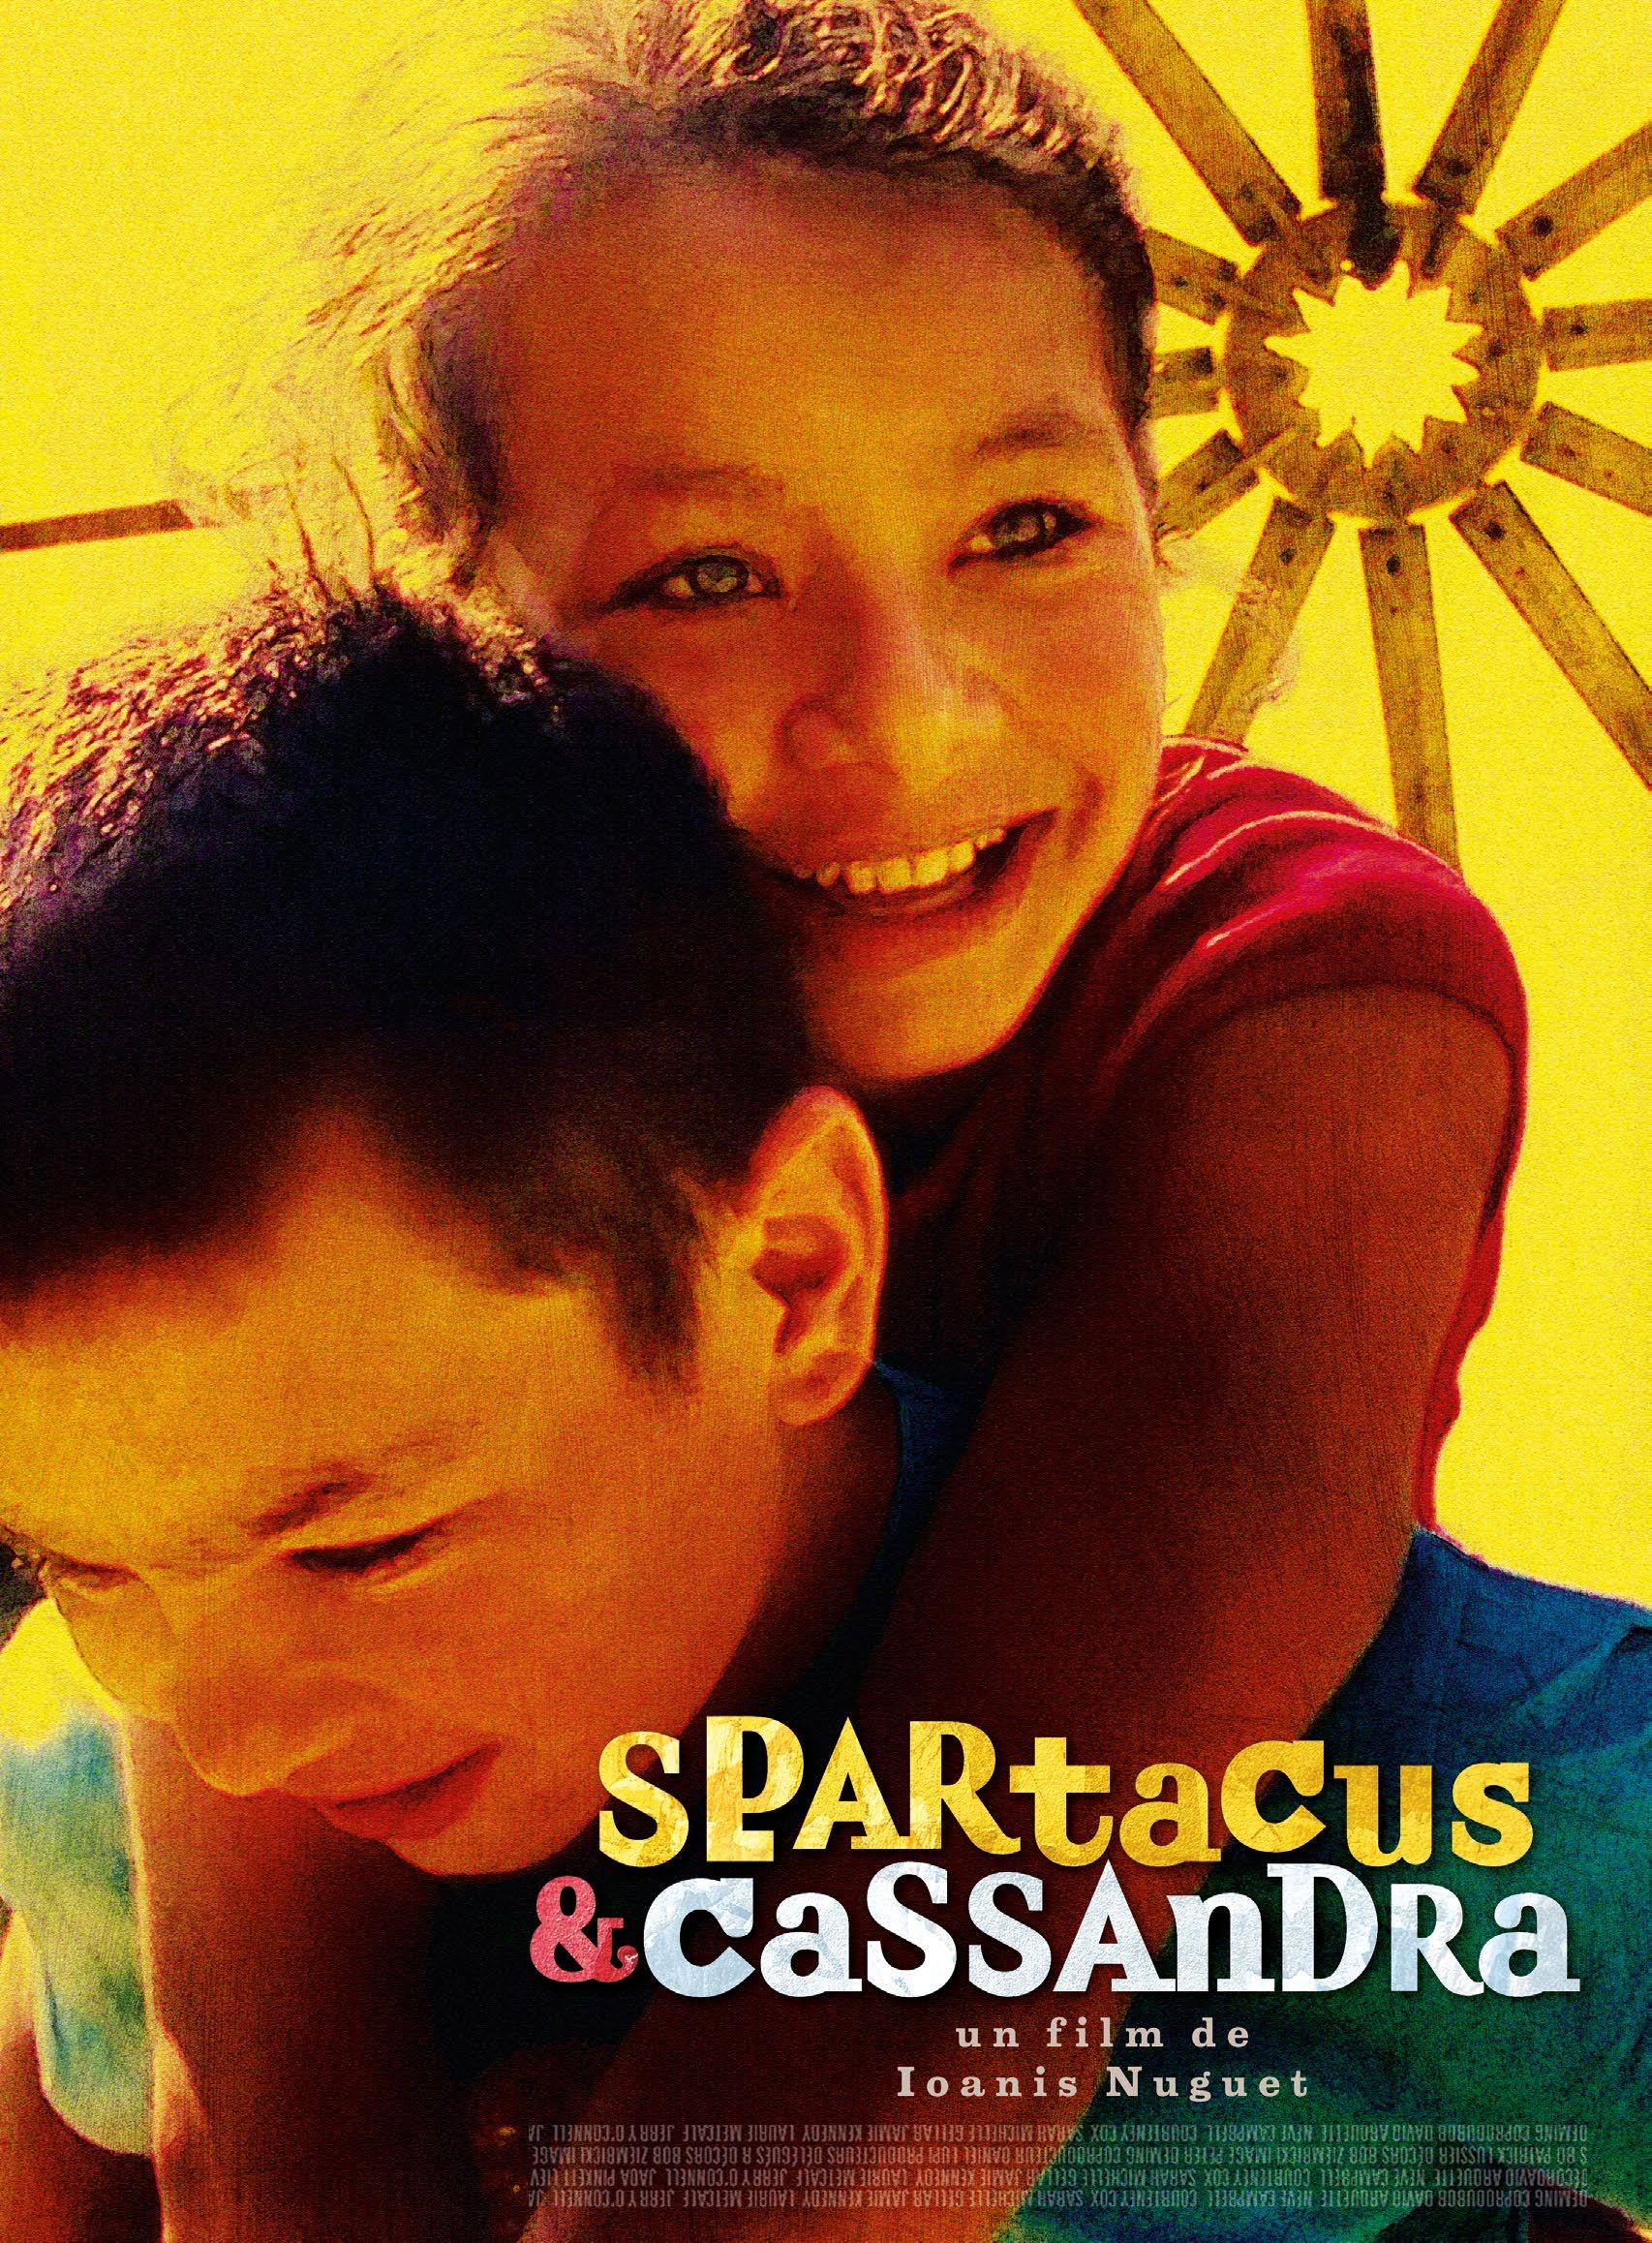 SpartacusEtCassandra